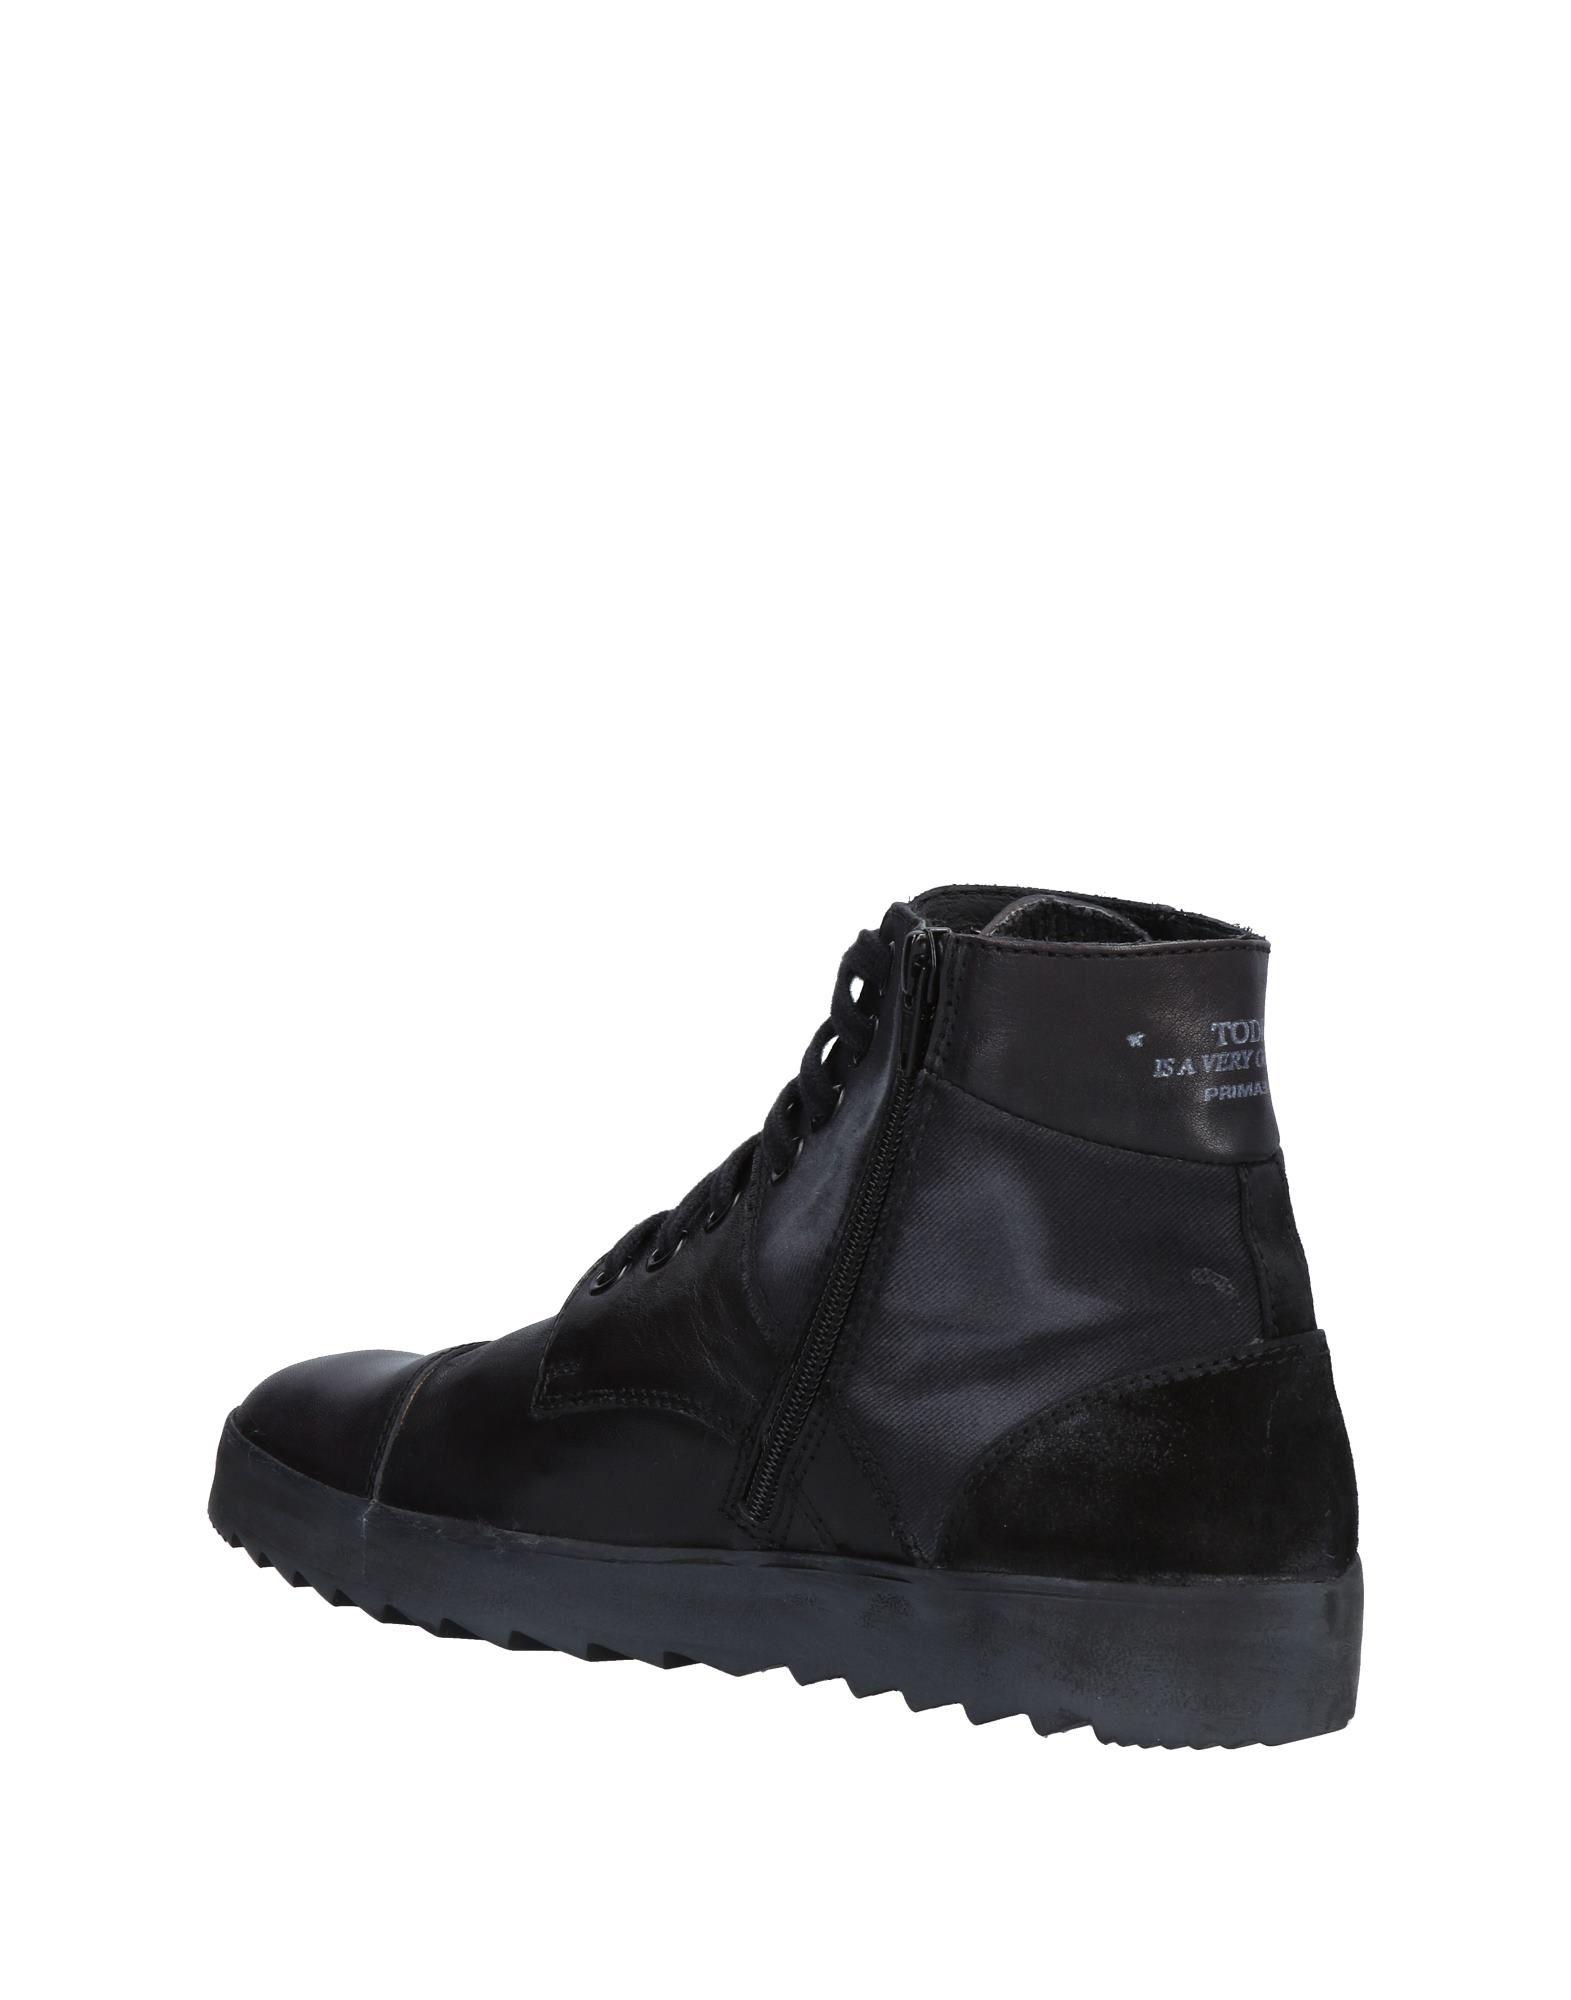 Rabatt Schuhe echte Schuhe Rabatt Primabase Turnschuhes Herren 11473987VC 35c875